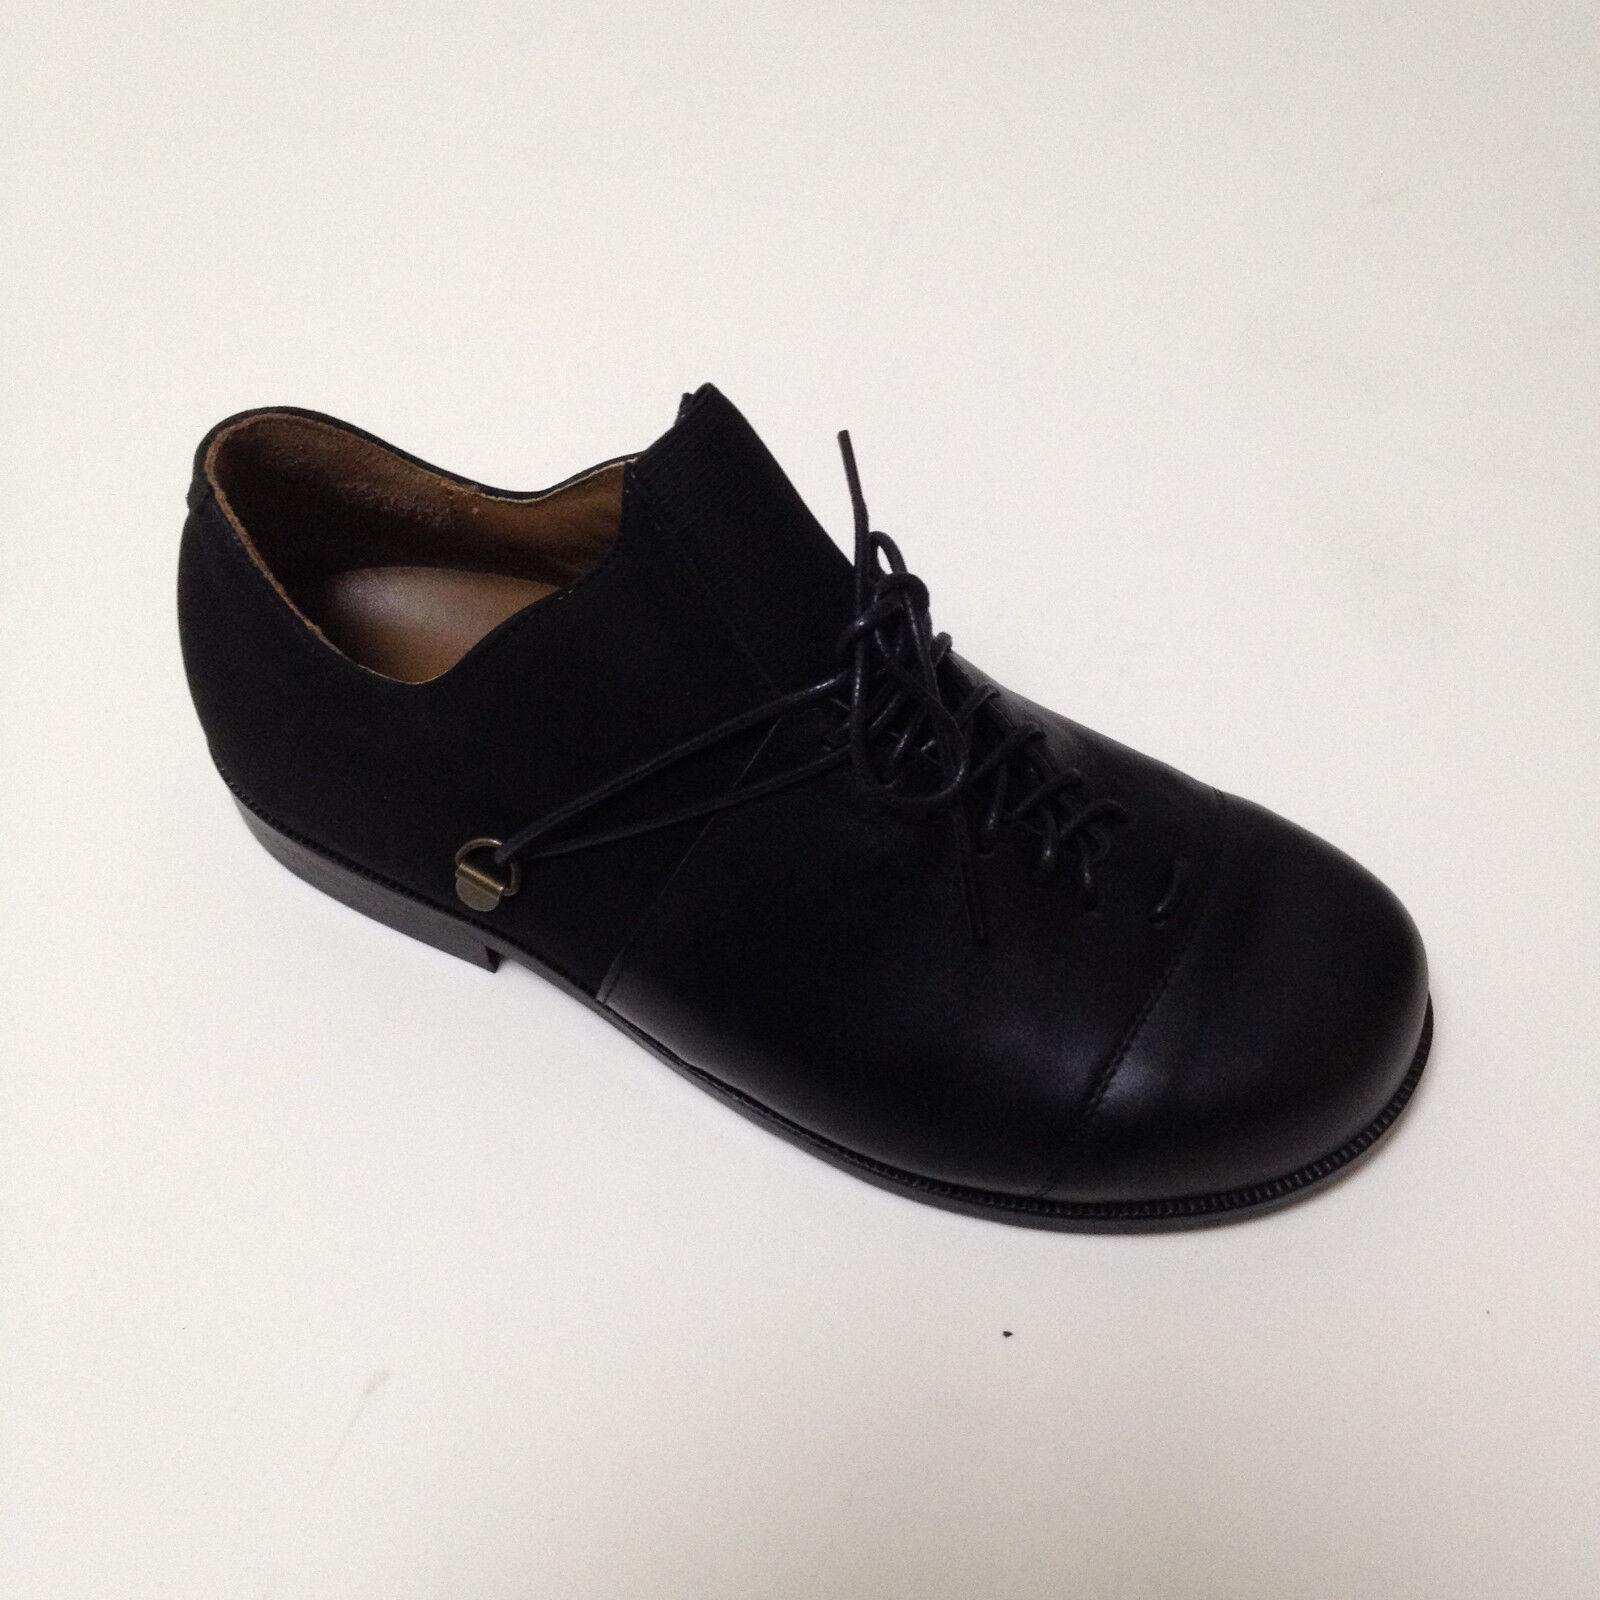 Berkemann Berkemann Berkemann zapato bajo única señora loses plantilla talla 36 (3,5)  7323 929    punto de venta barato